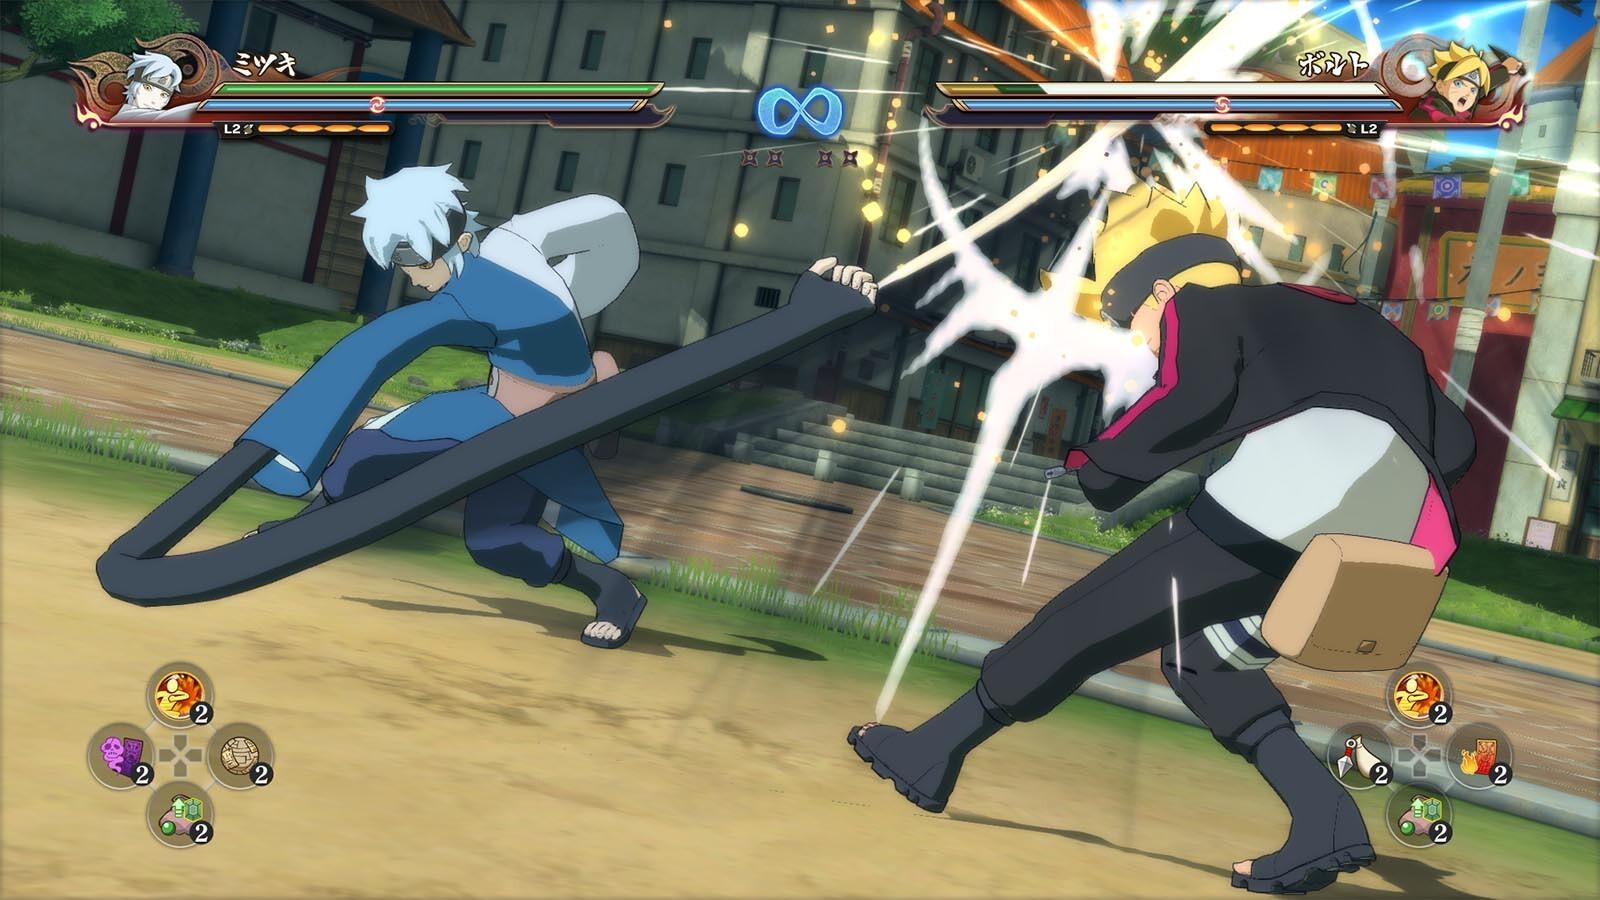 101 Gambar Naruto Ninja Storm 4 HD